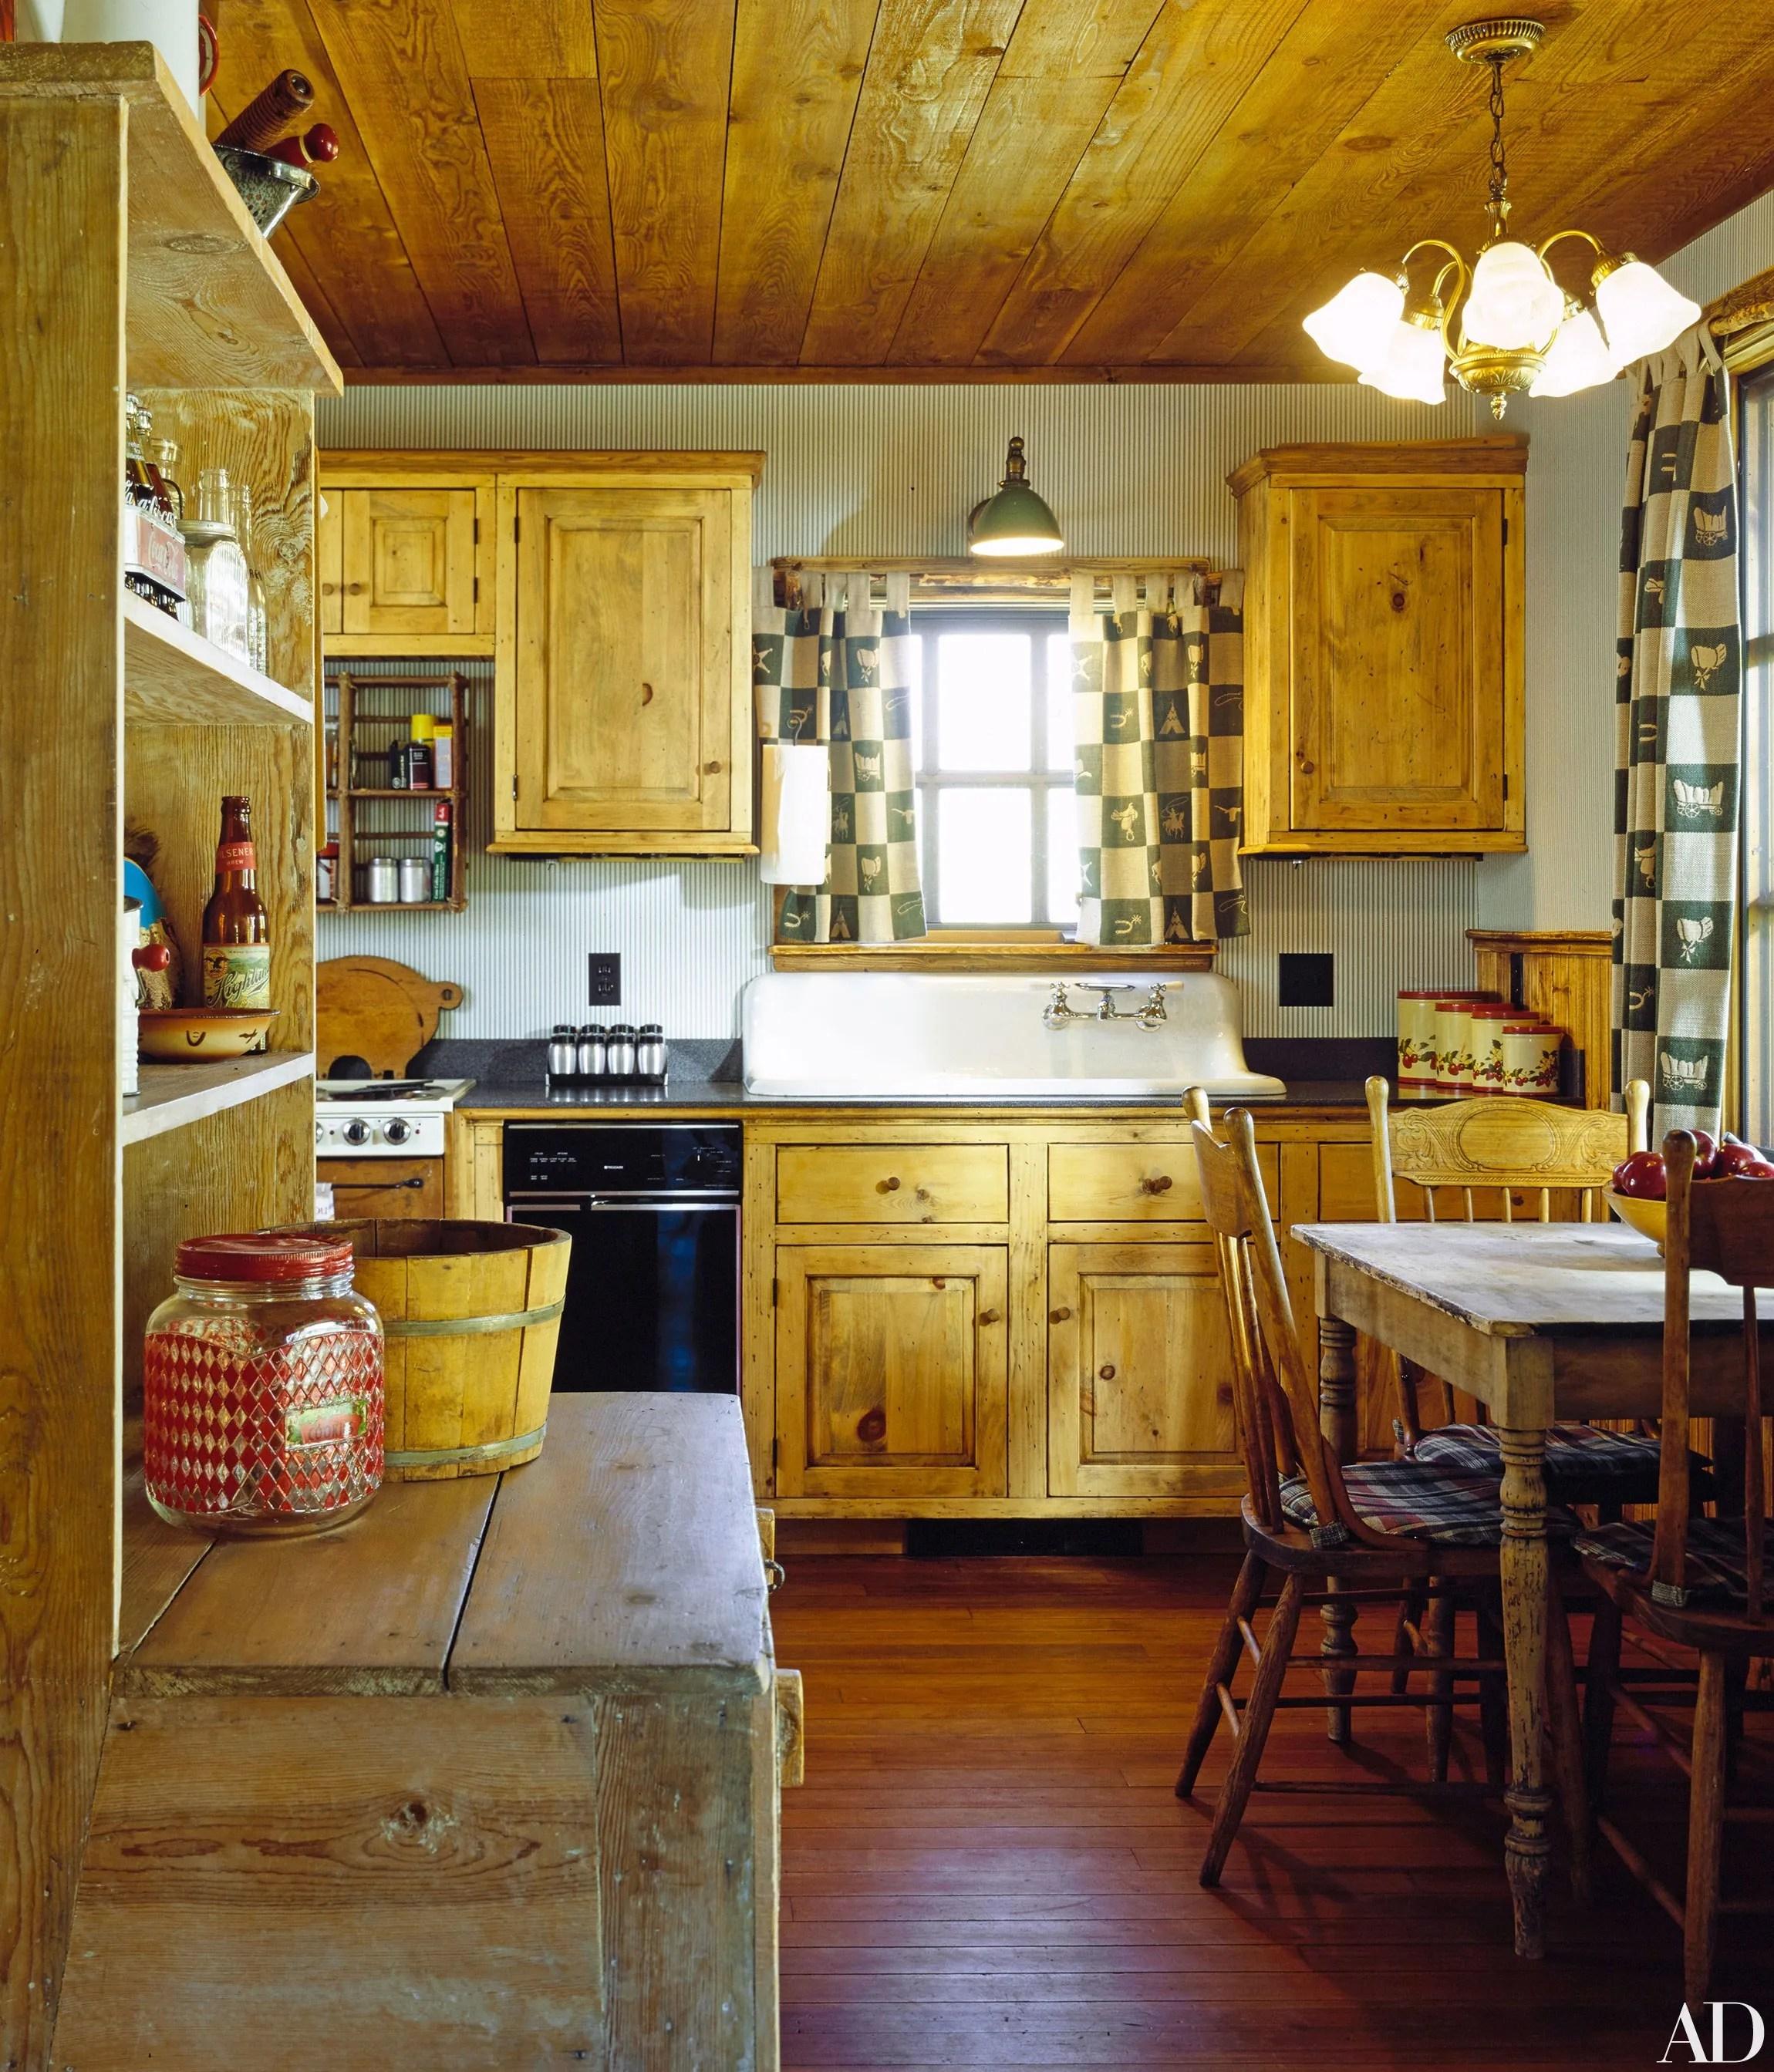 The Best 1990s Interior Design Trends We Love